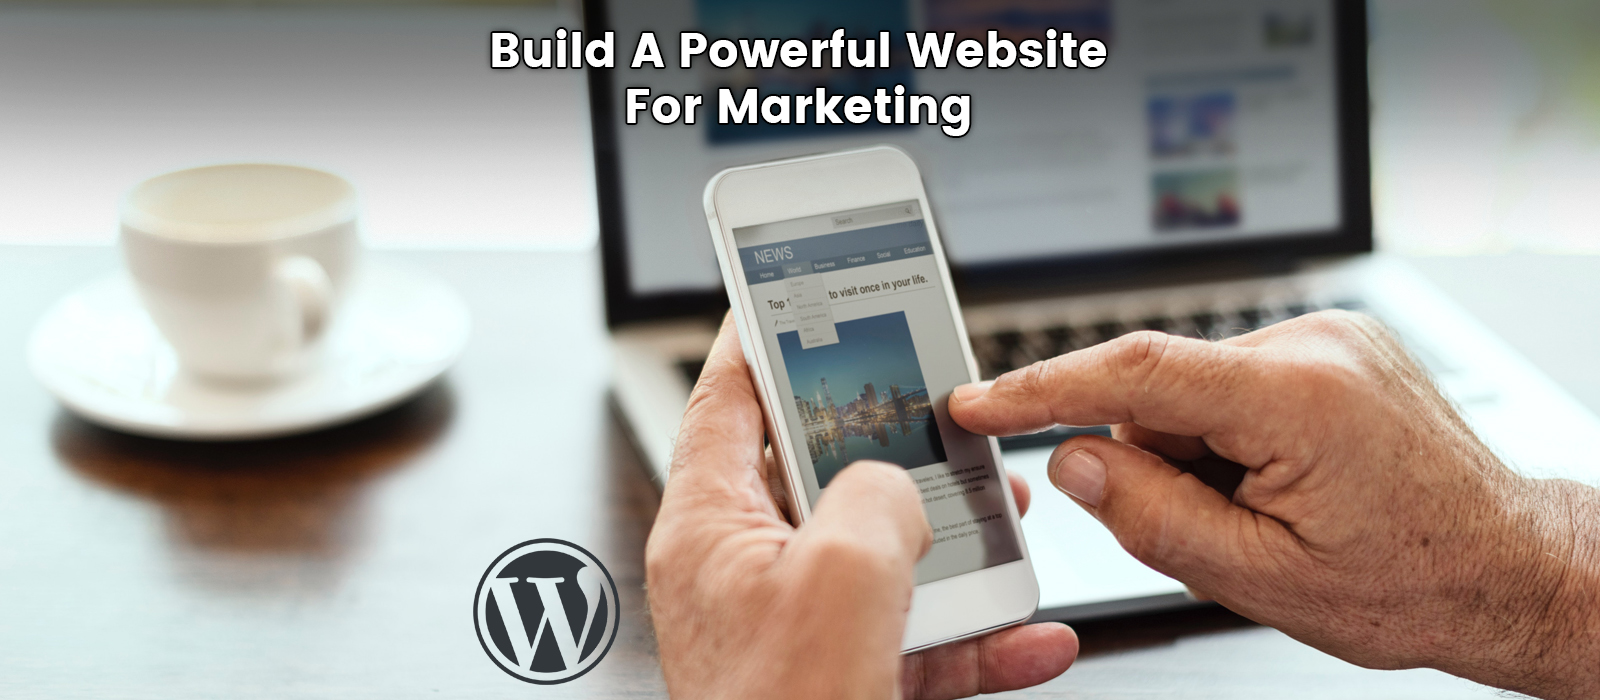 wordpress-marketing-theme-course-pouya-eti